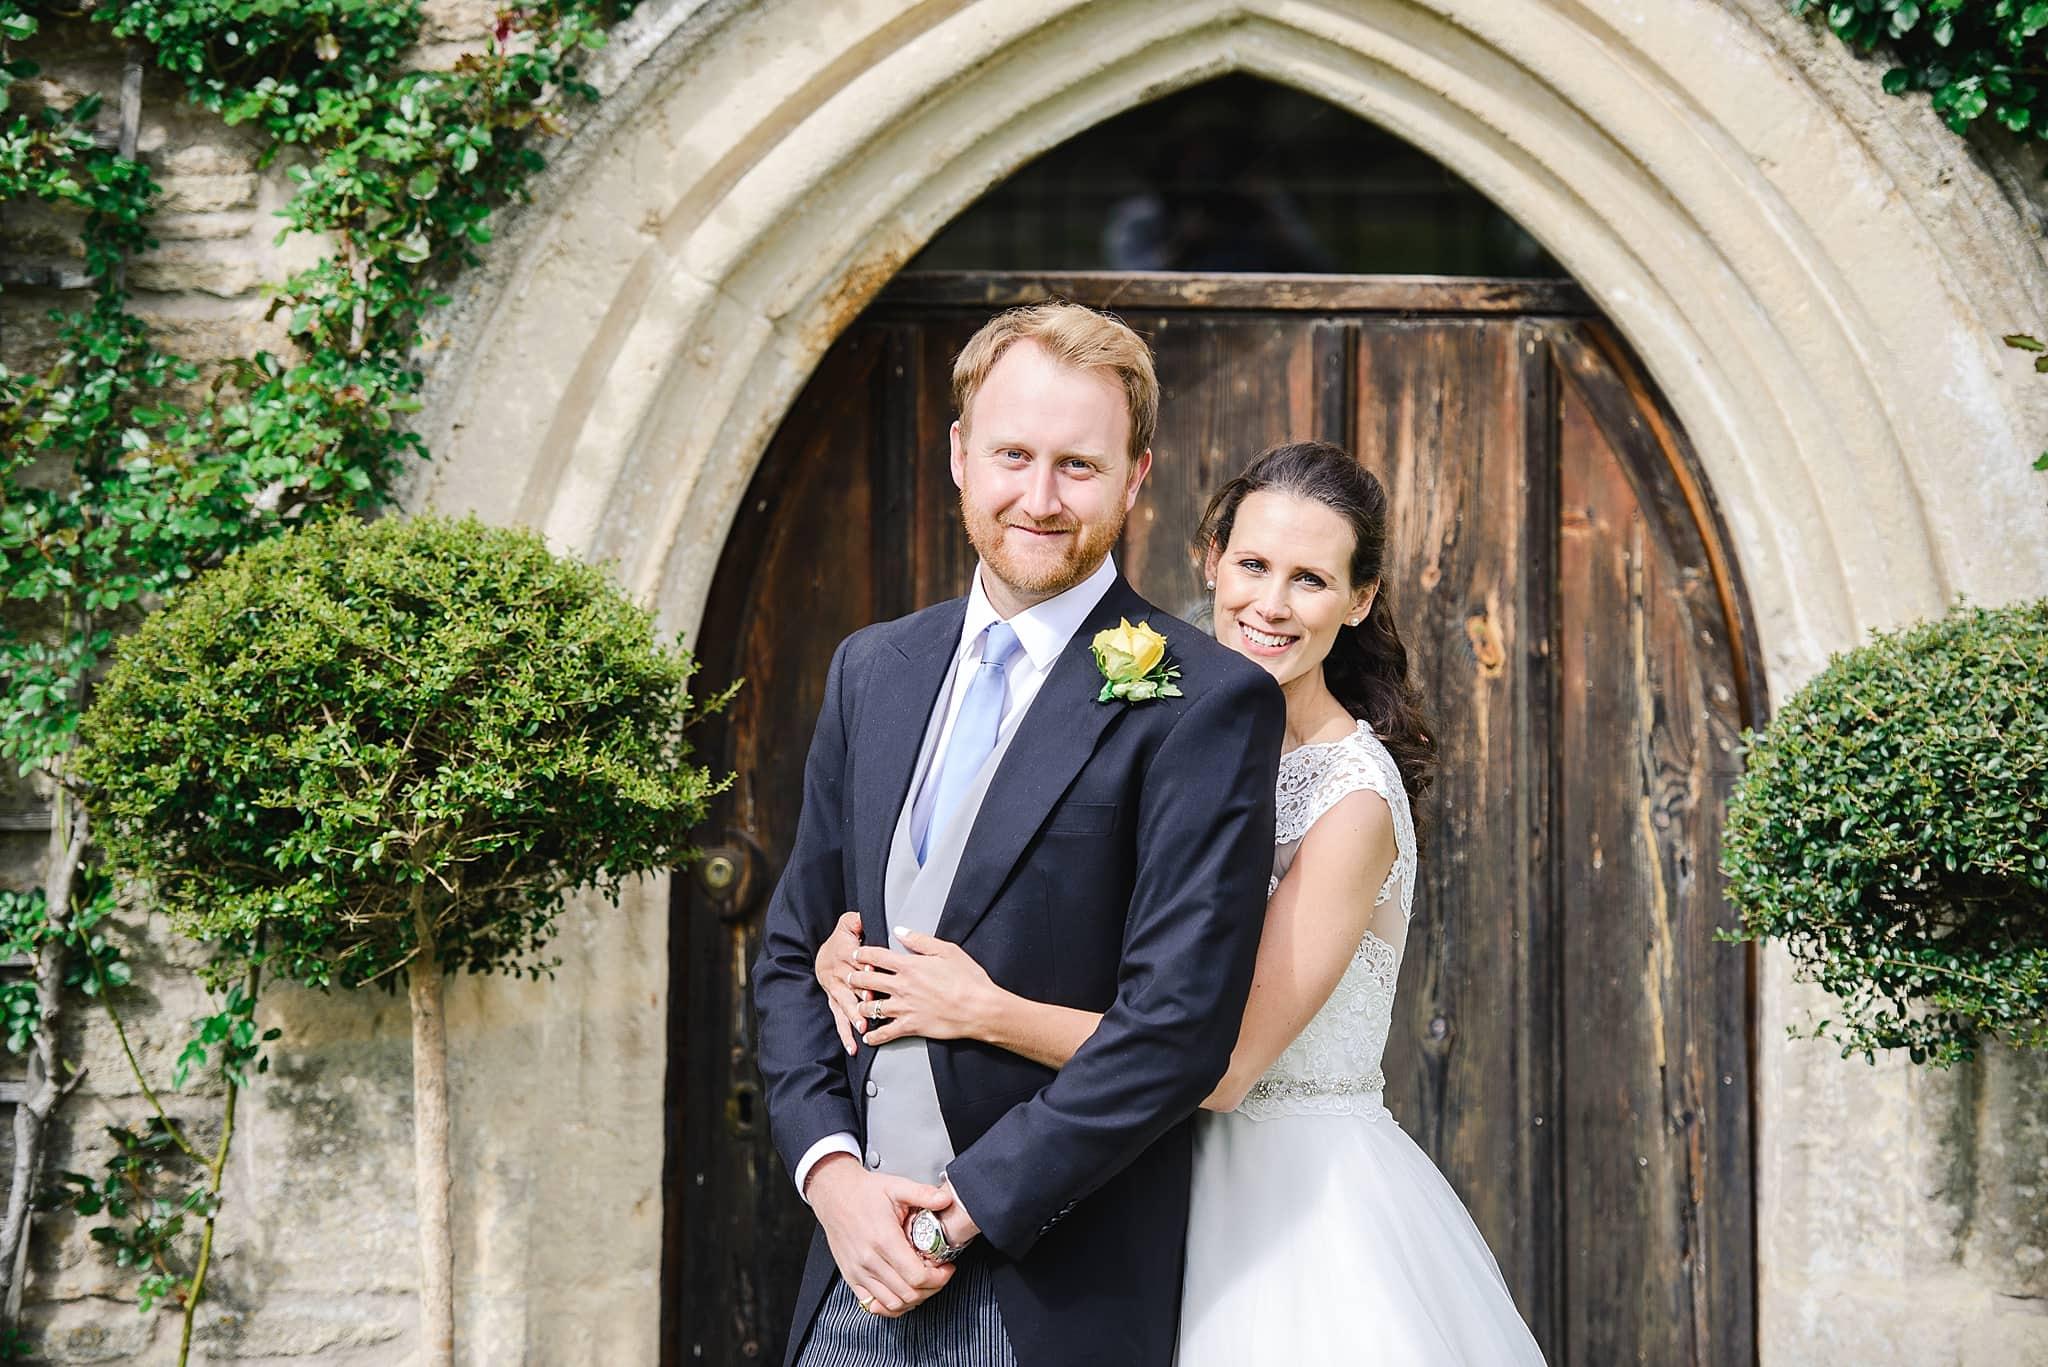 Bride hugs her groom from behind in front of an old door at Wick Farm wedding venue